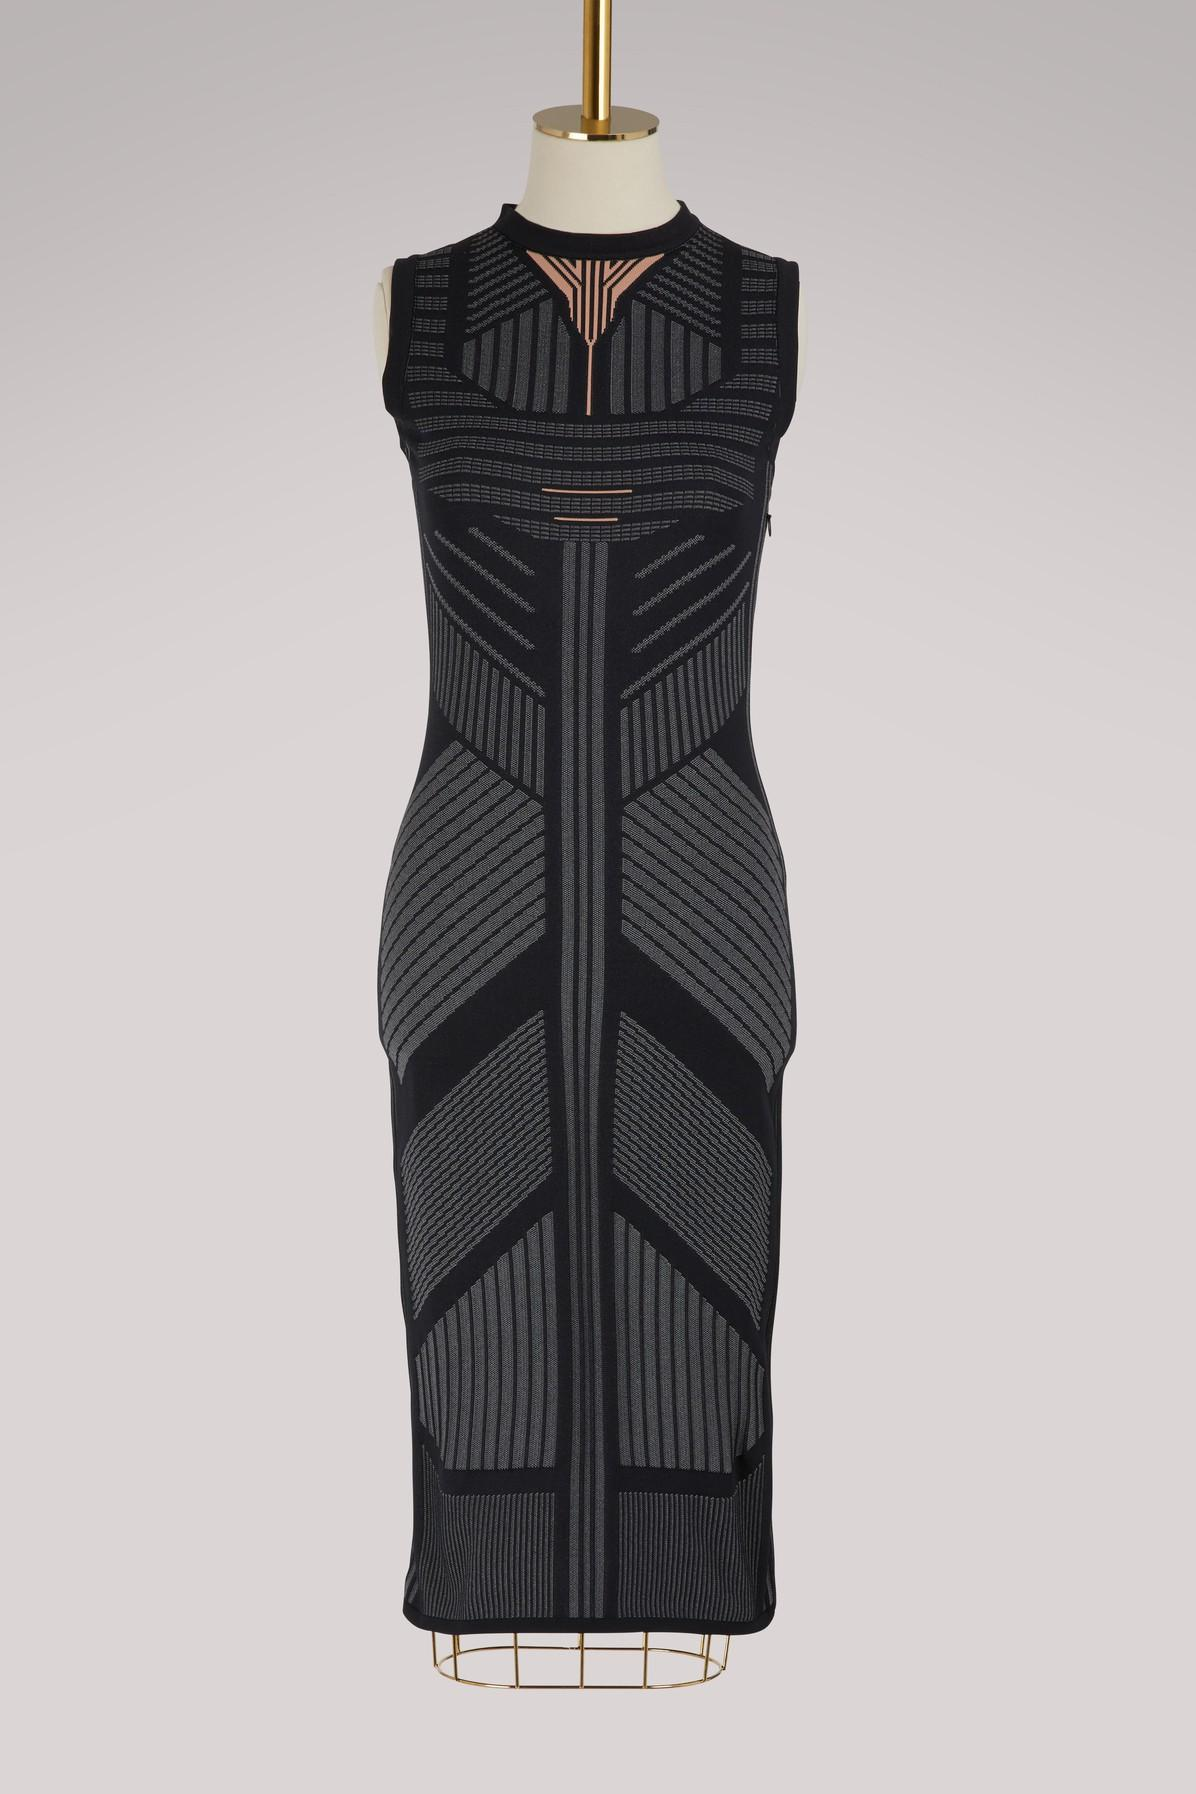 f85c58162a Prada Sleeveless Nylon-tech Dress in Black - Save 70% - Lyst